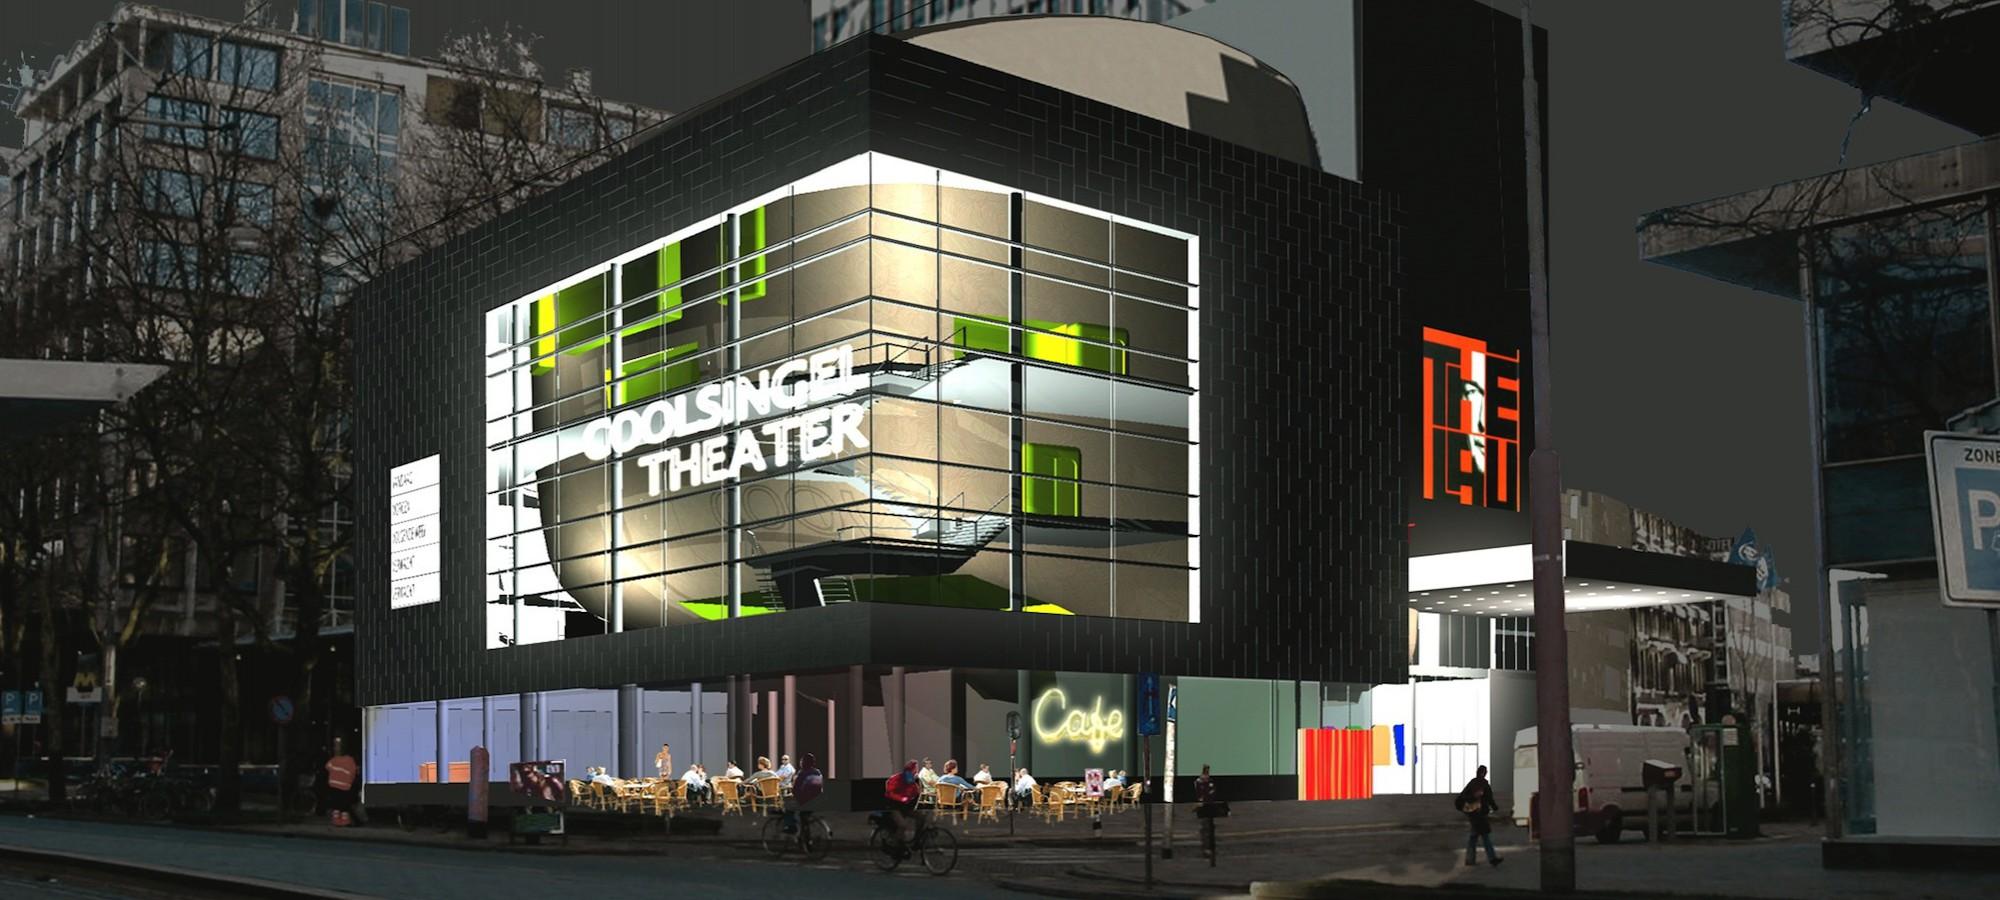 Coolsingeltheater, Rotterdam  © drost + van veen architecten bv